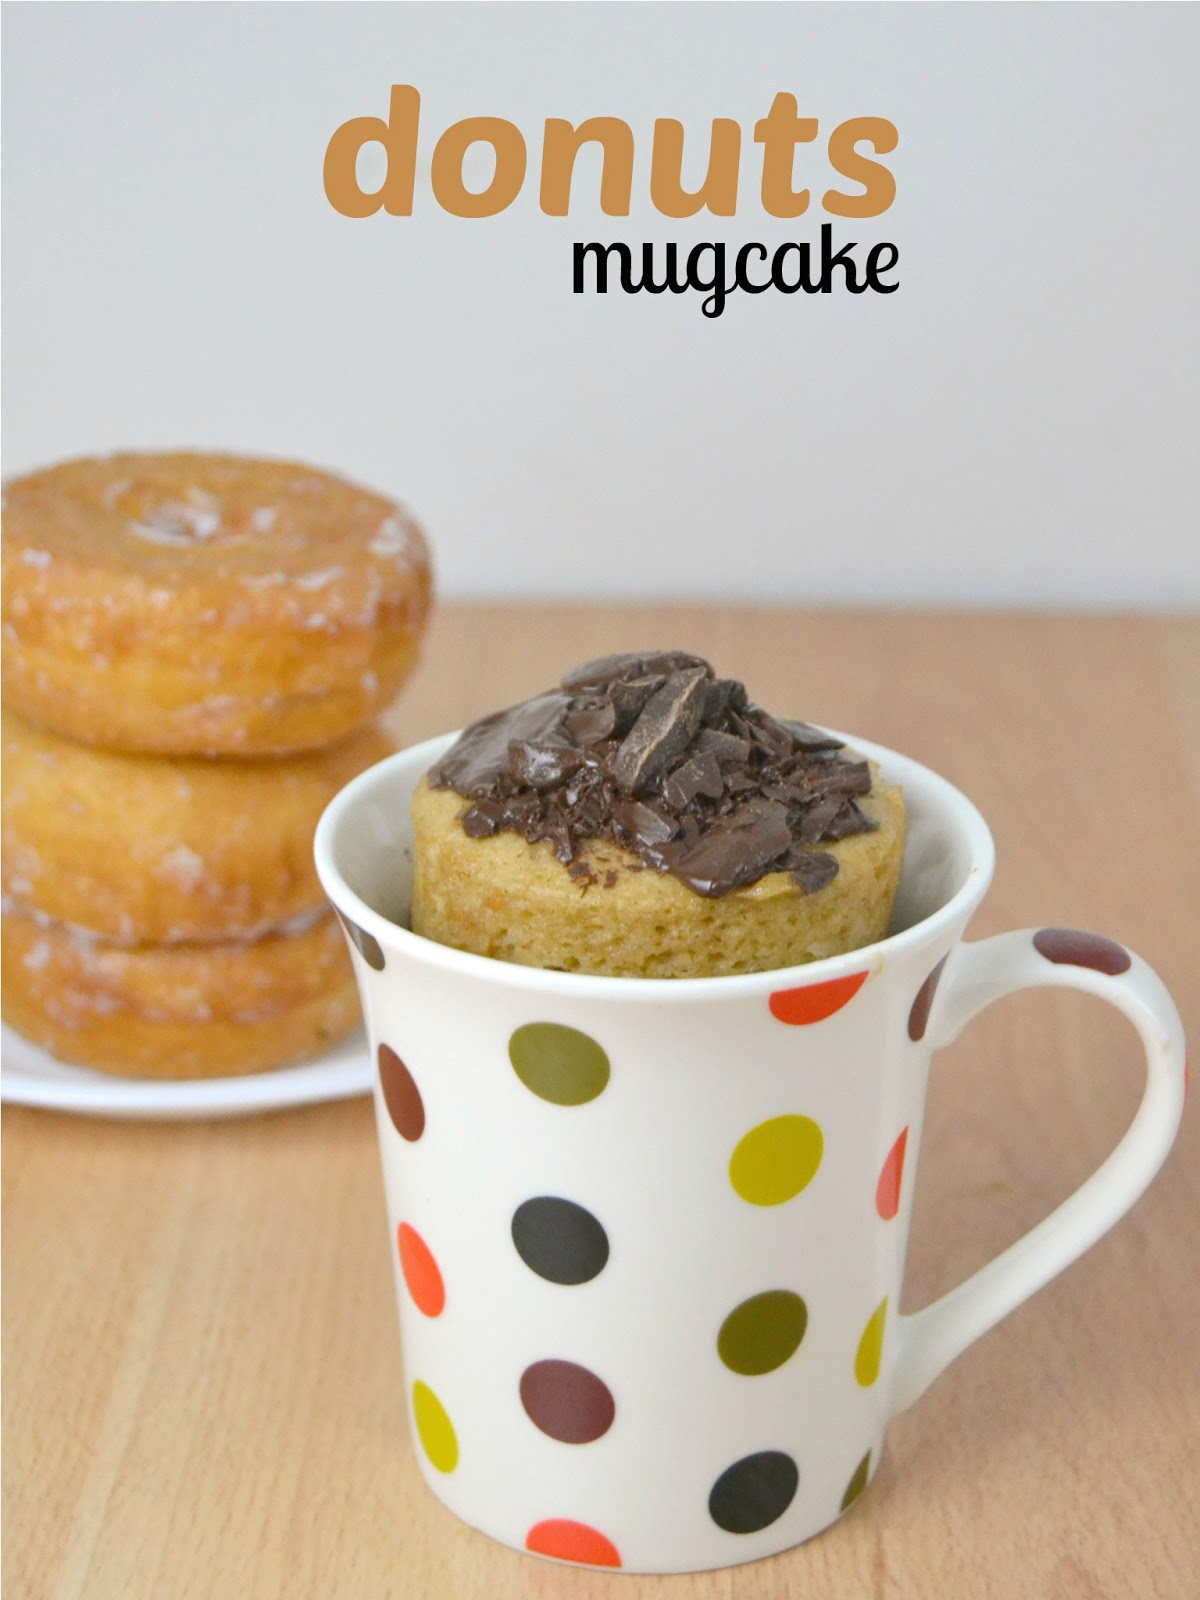 Mug Cake No Baking Powder Or Soda Or Coclent Chips